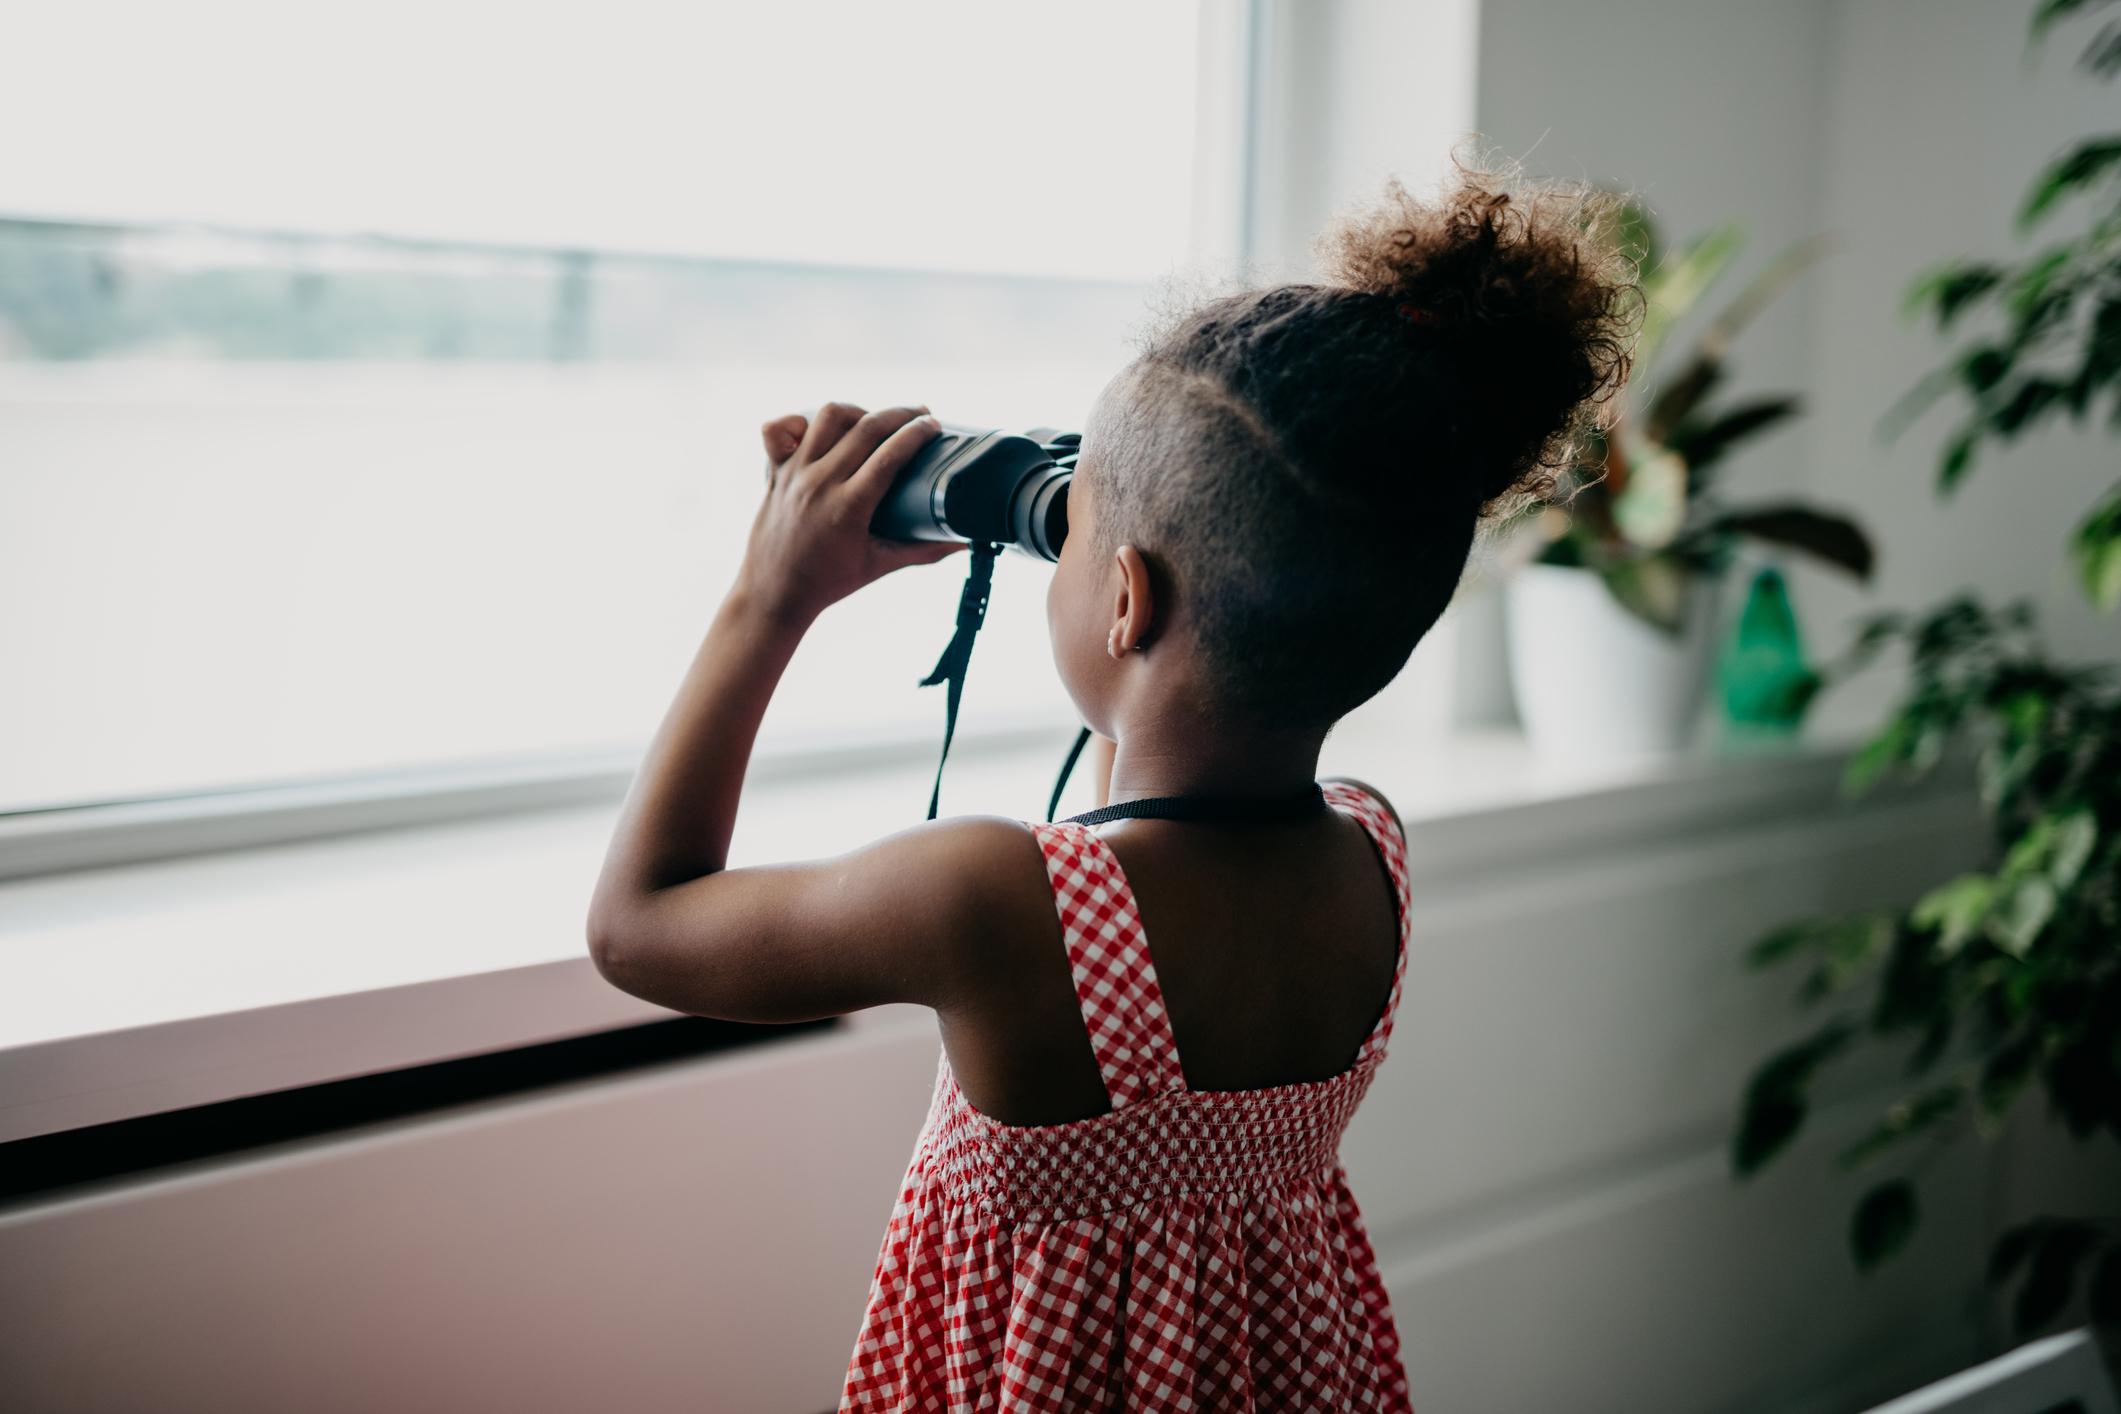 Rear view at african kid looking through binoculars